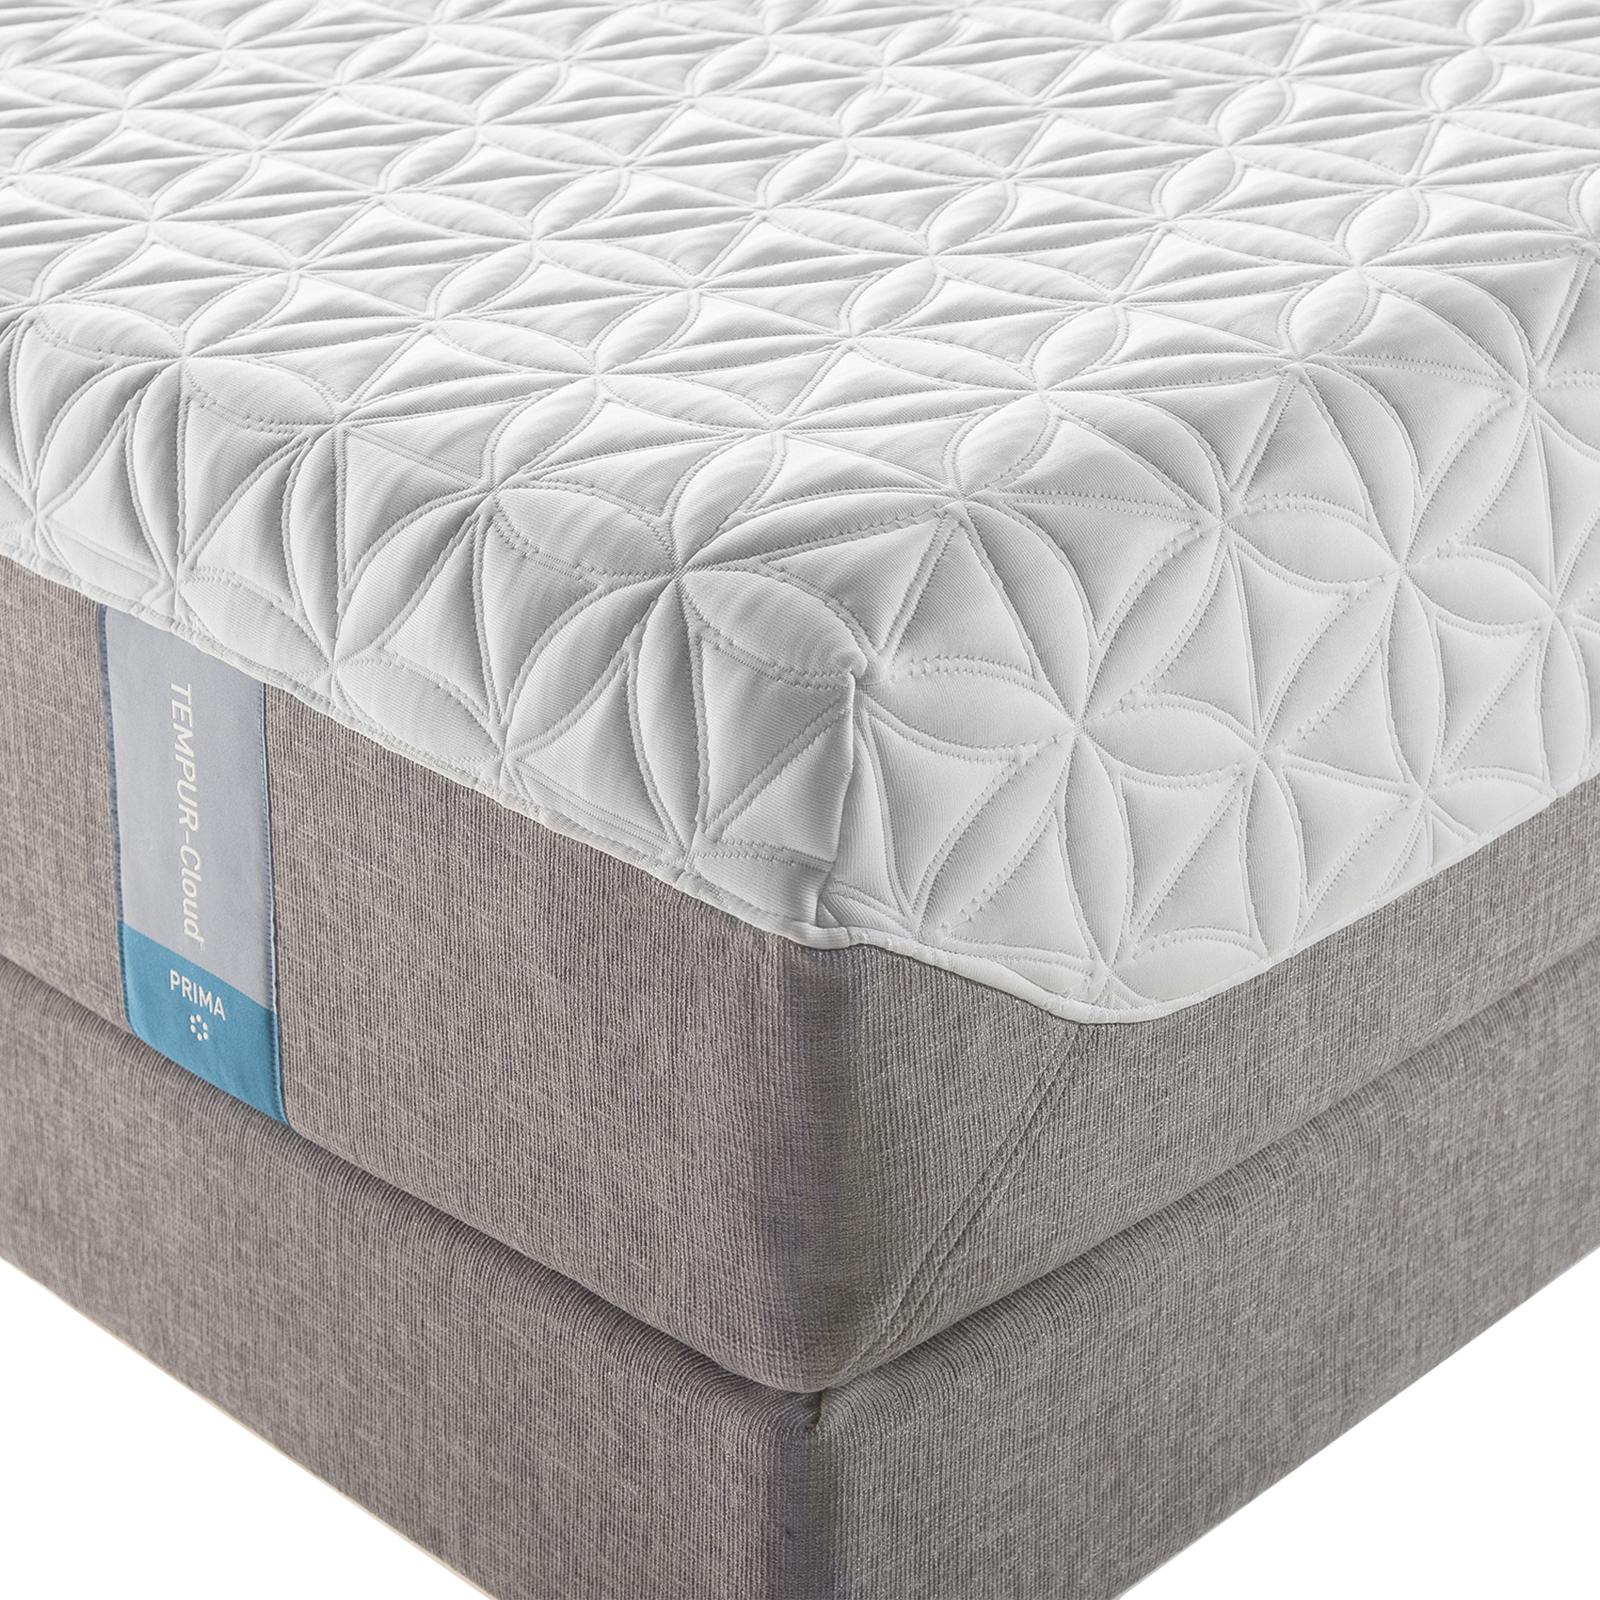 tempurpedic prima california king mattress